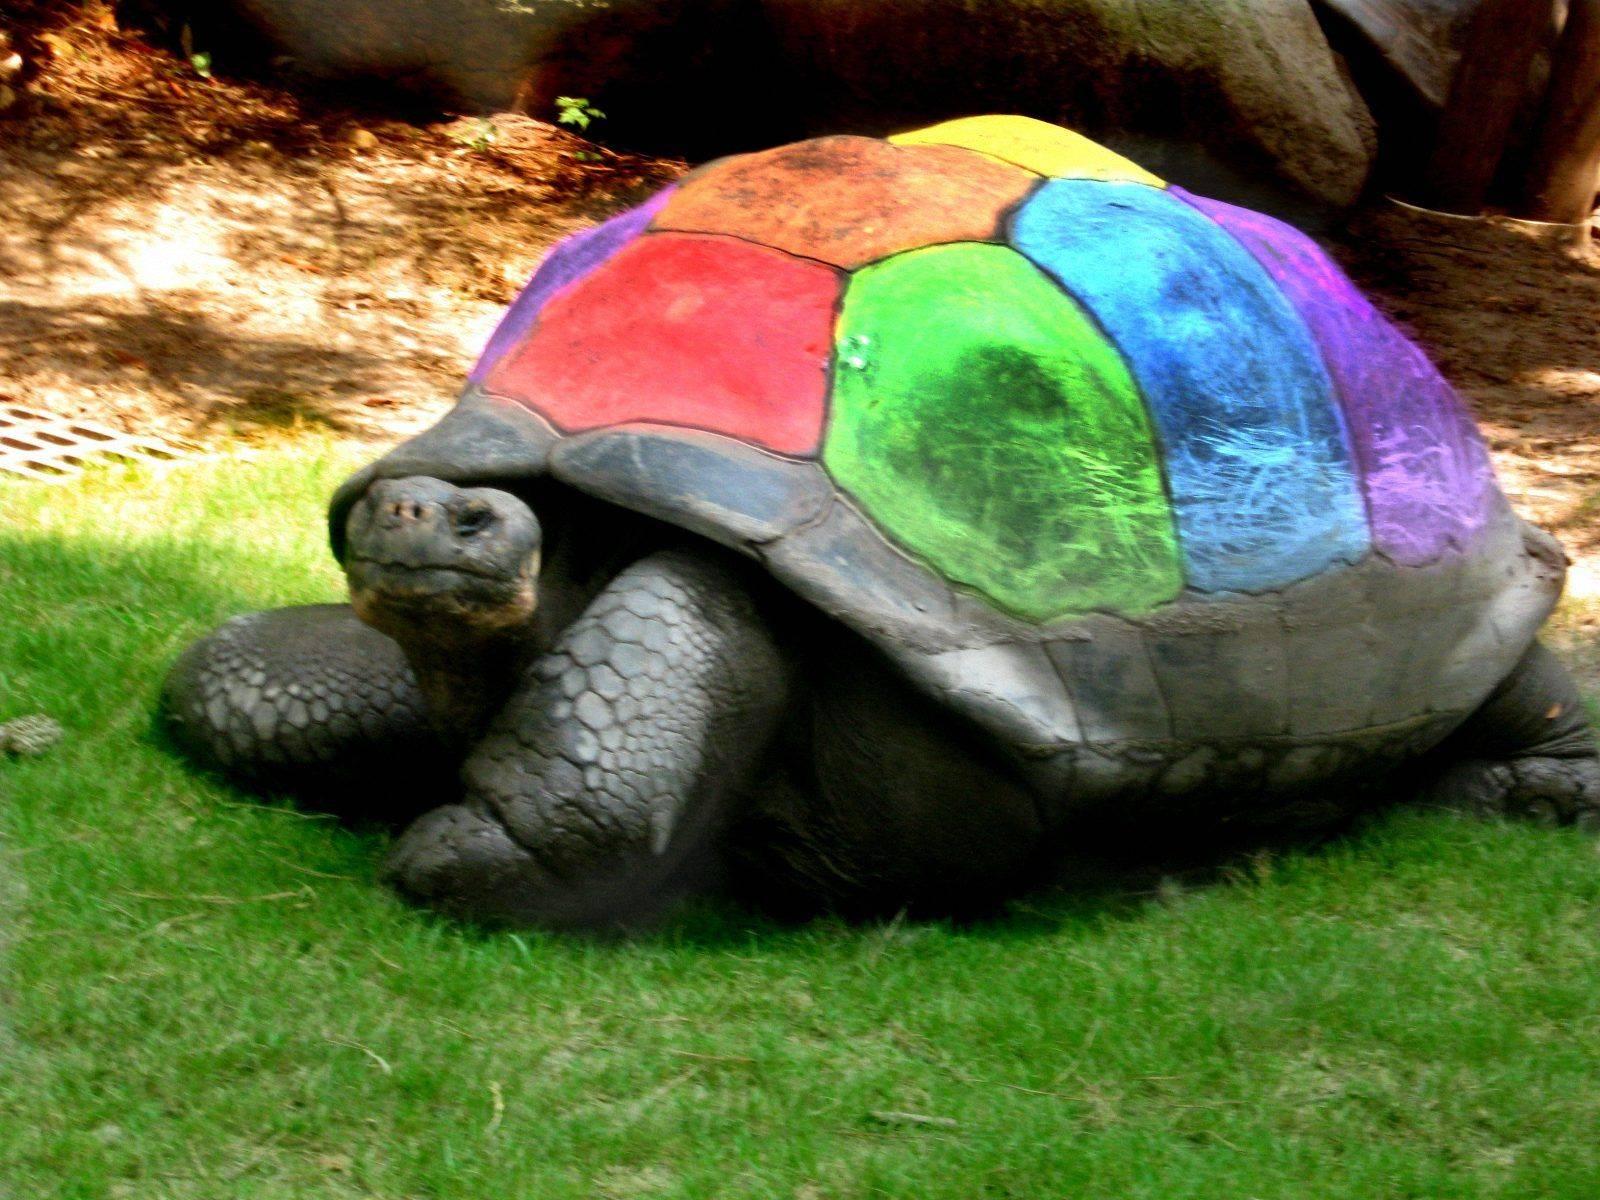 Звездчатая черепаха, полосатые красавицы